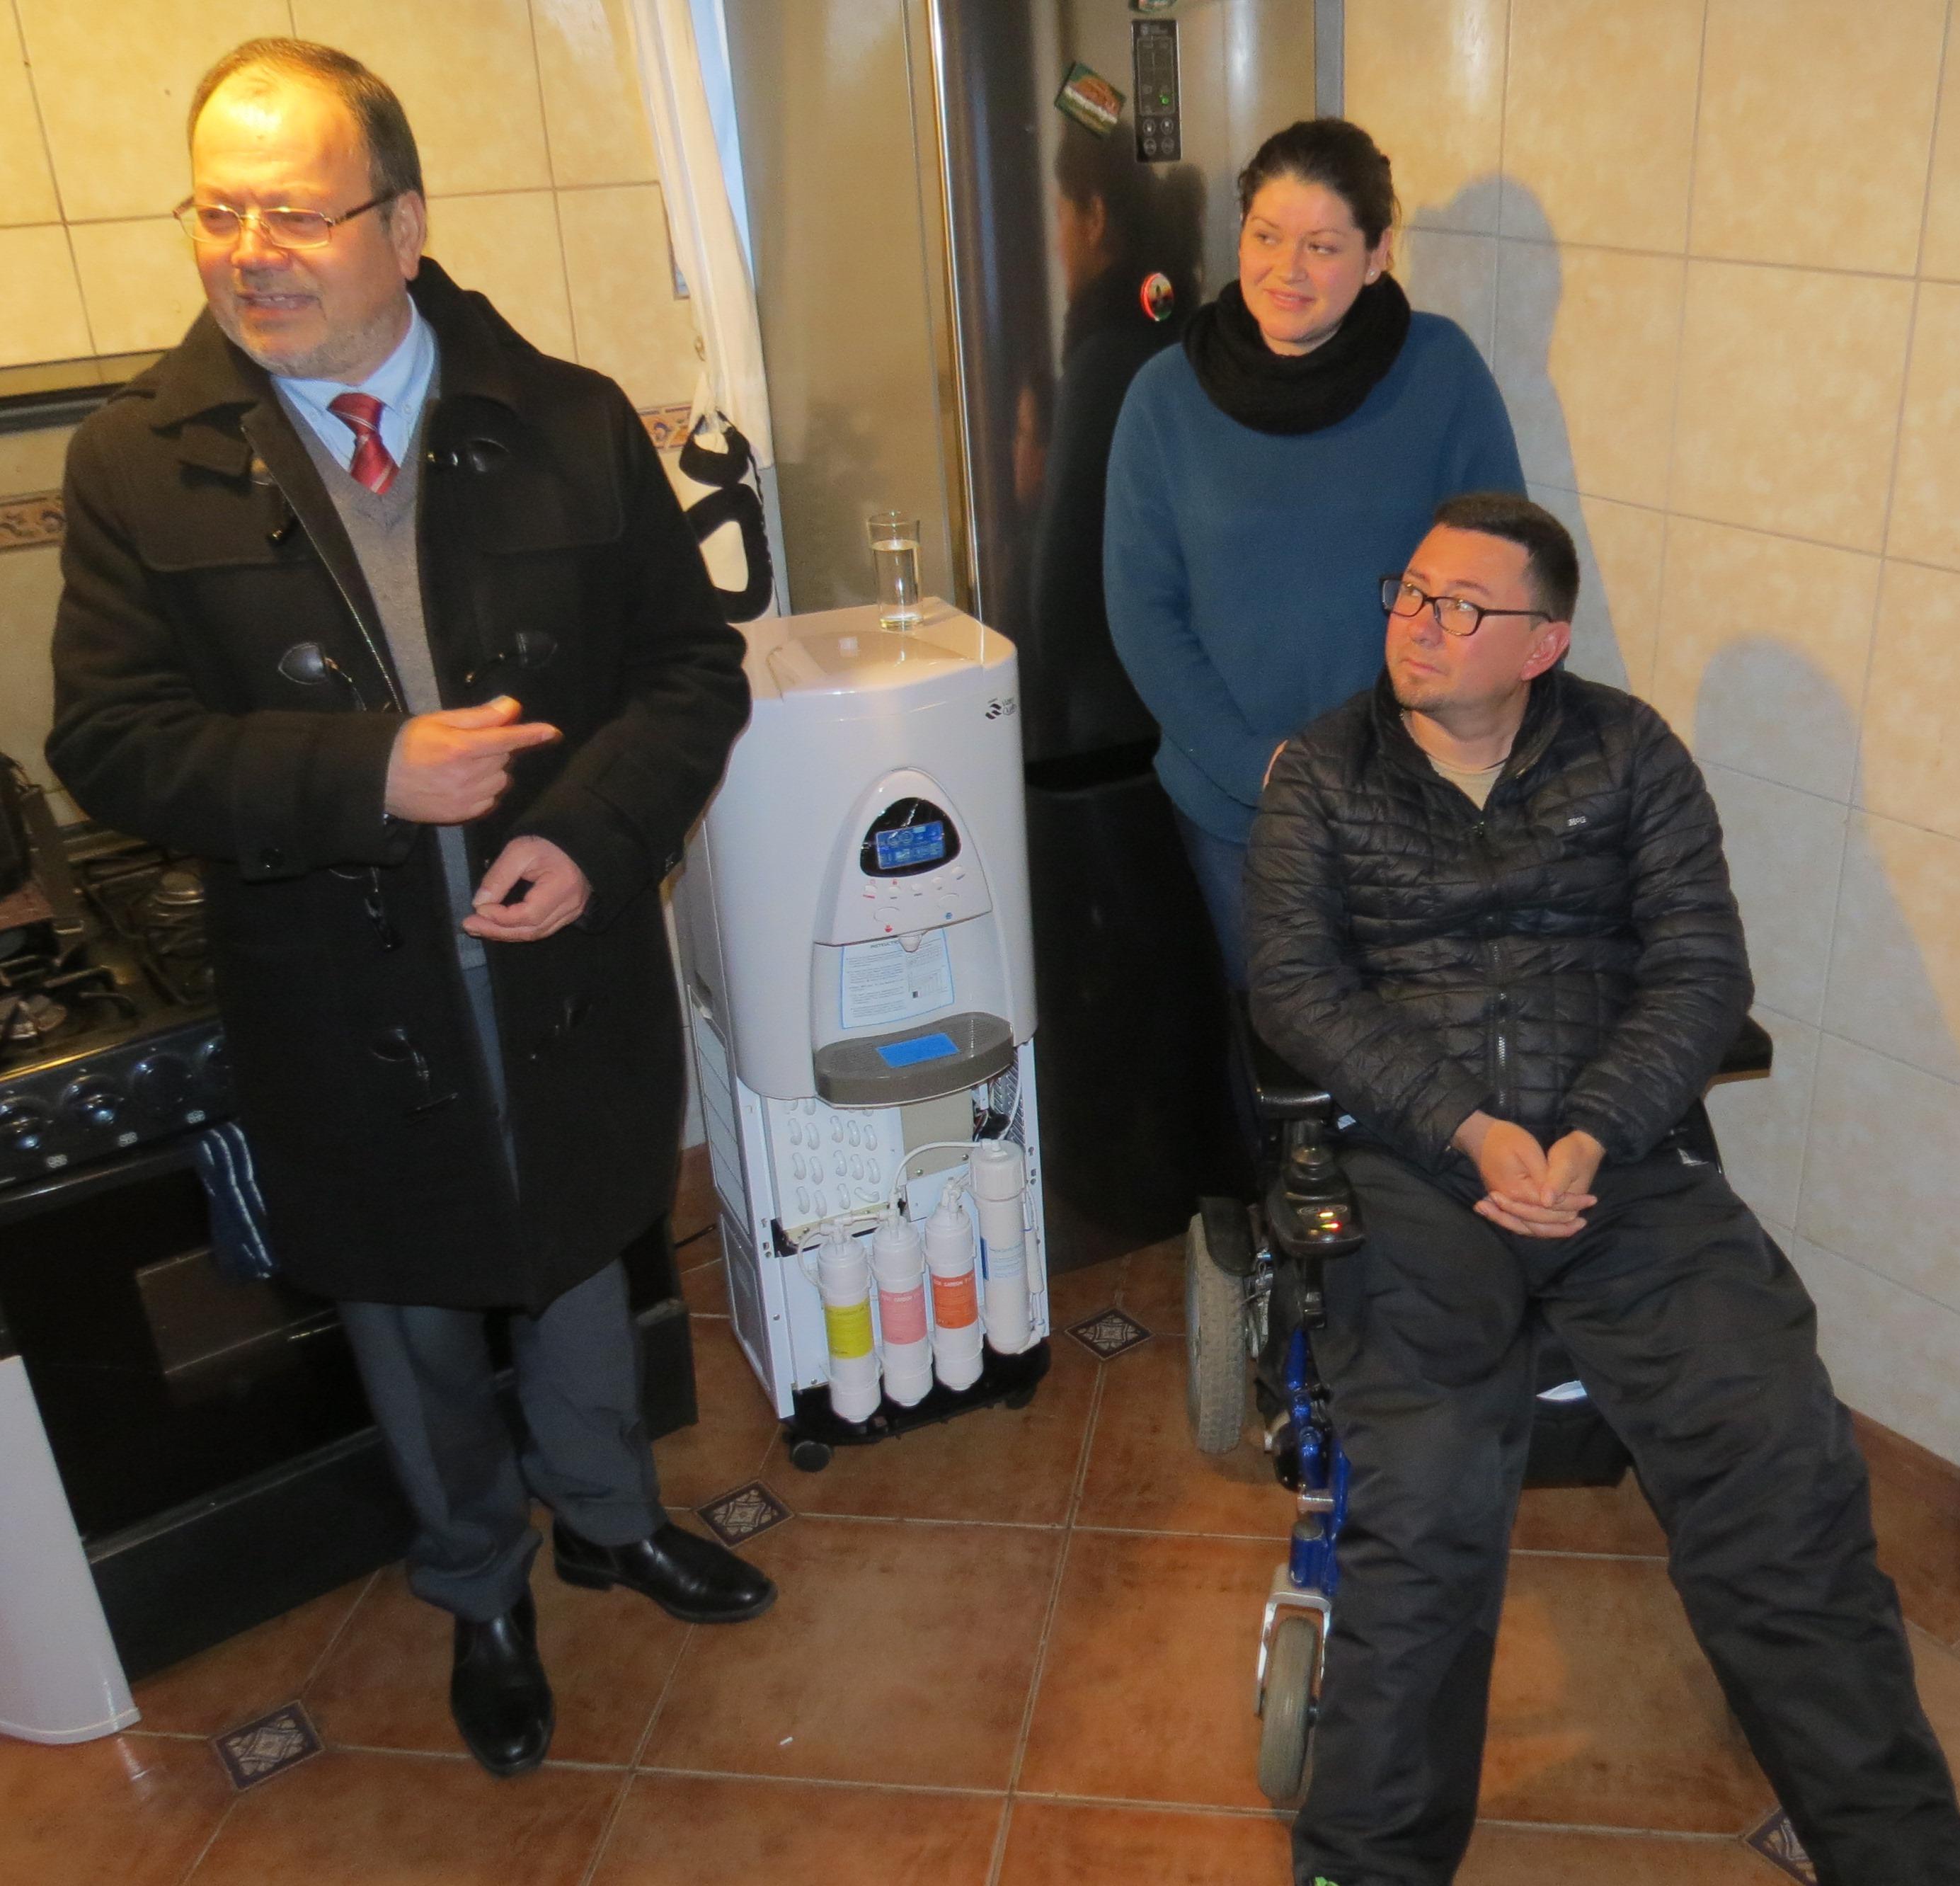 Generador de agua atmosférica para zonas con escases hídrica